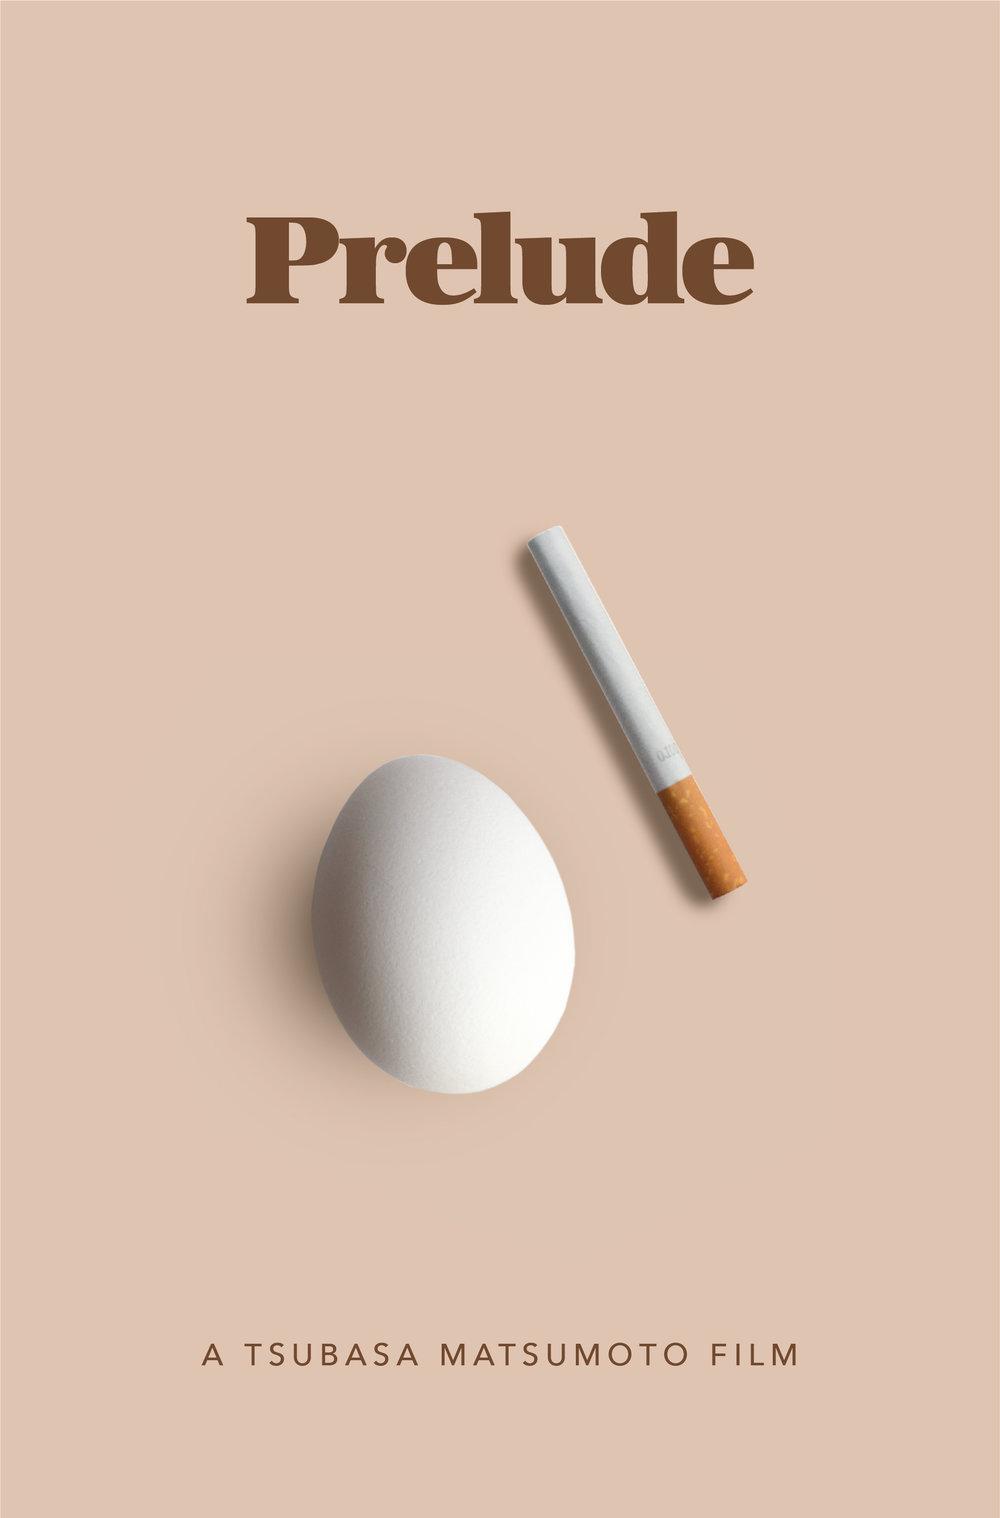 Prelude Movie Poster - RGB.jpg